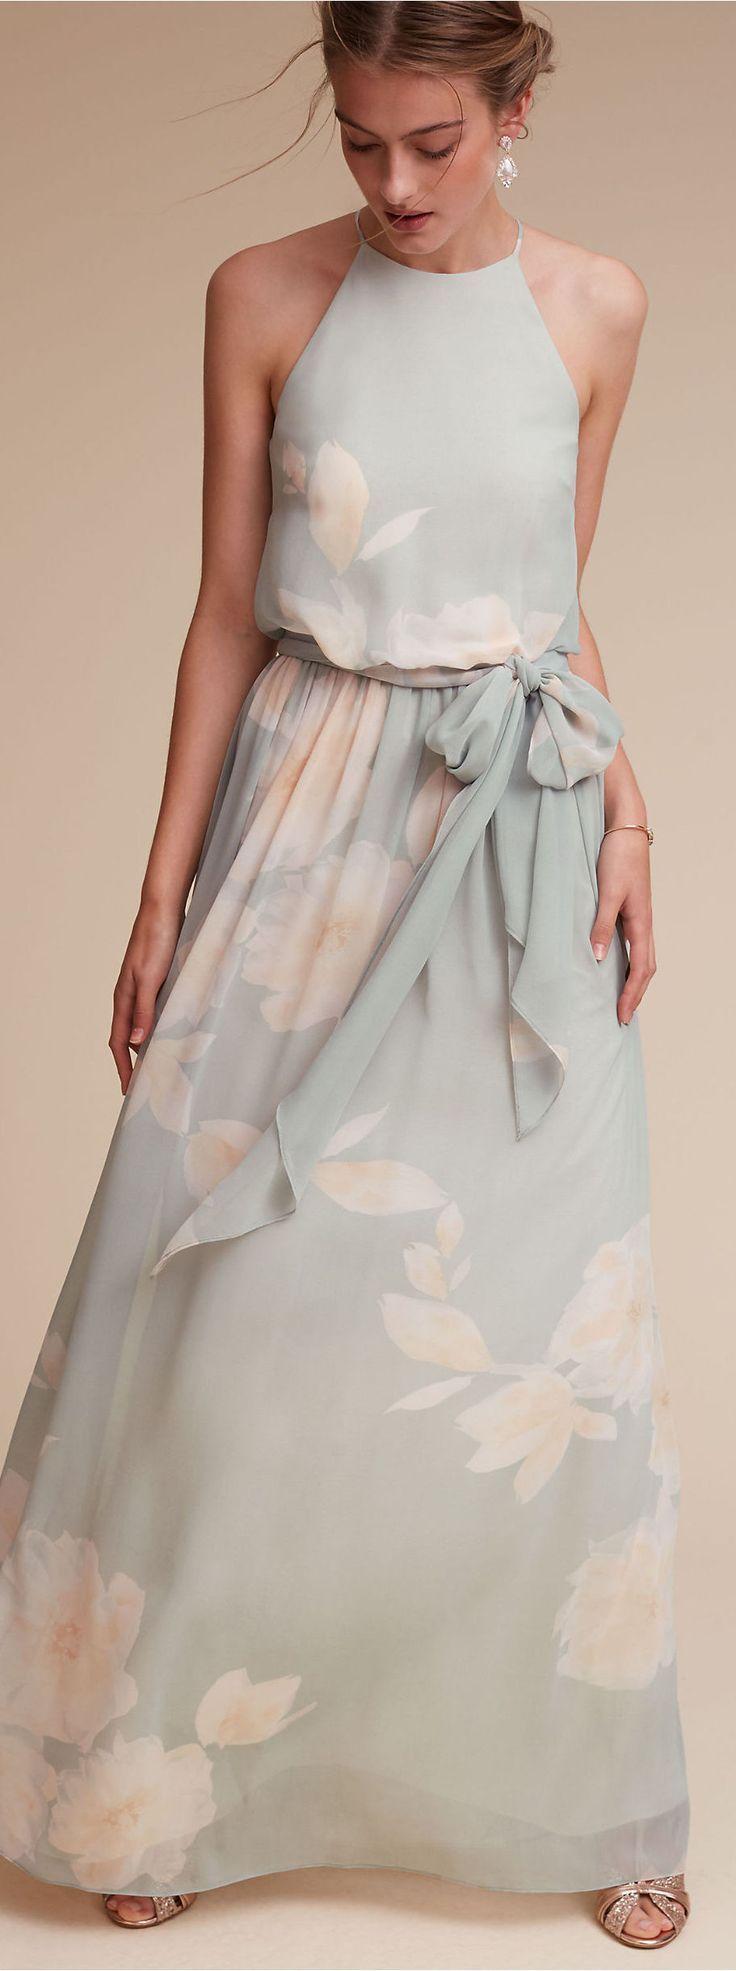 Pastel Floral Bridesmaid Dress   BHLDN #bridesmaids